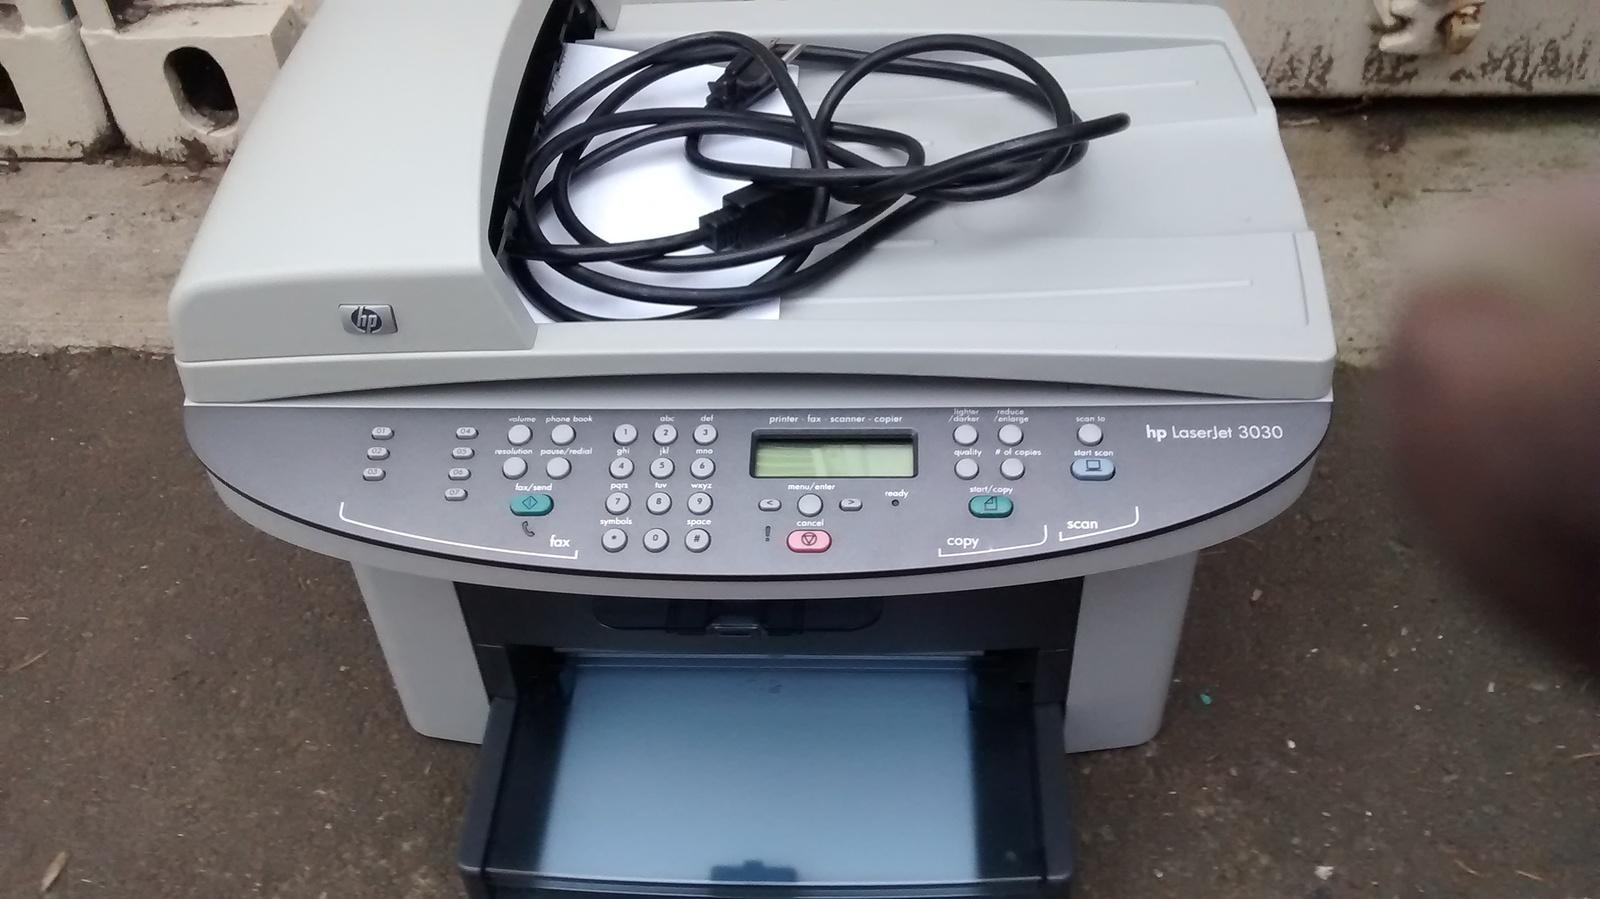 hp laserjet 3030 all in one printer fax scanner copier q2666a printers. Black Bedroom Furniture Sets. Home Design Ideas